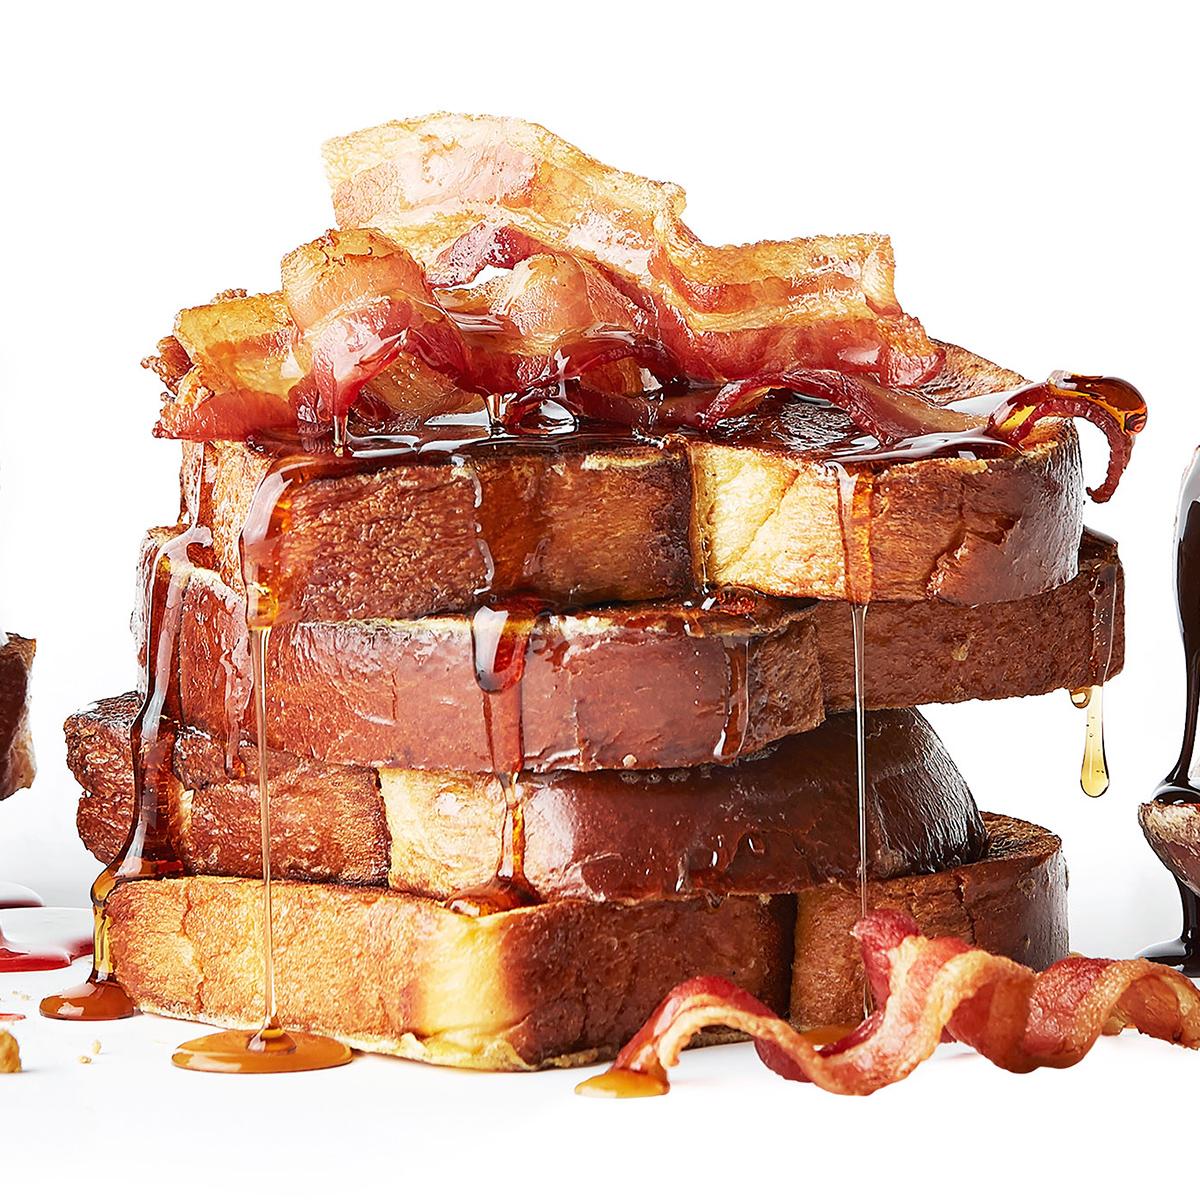 Maple-Bourbon Bacon French Toast